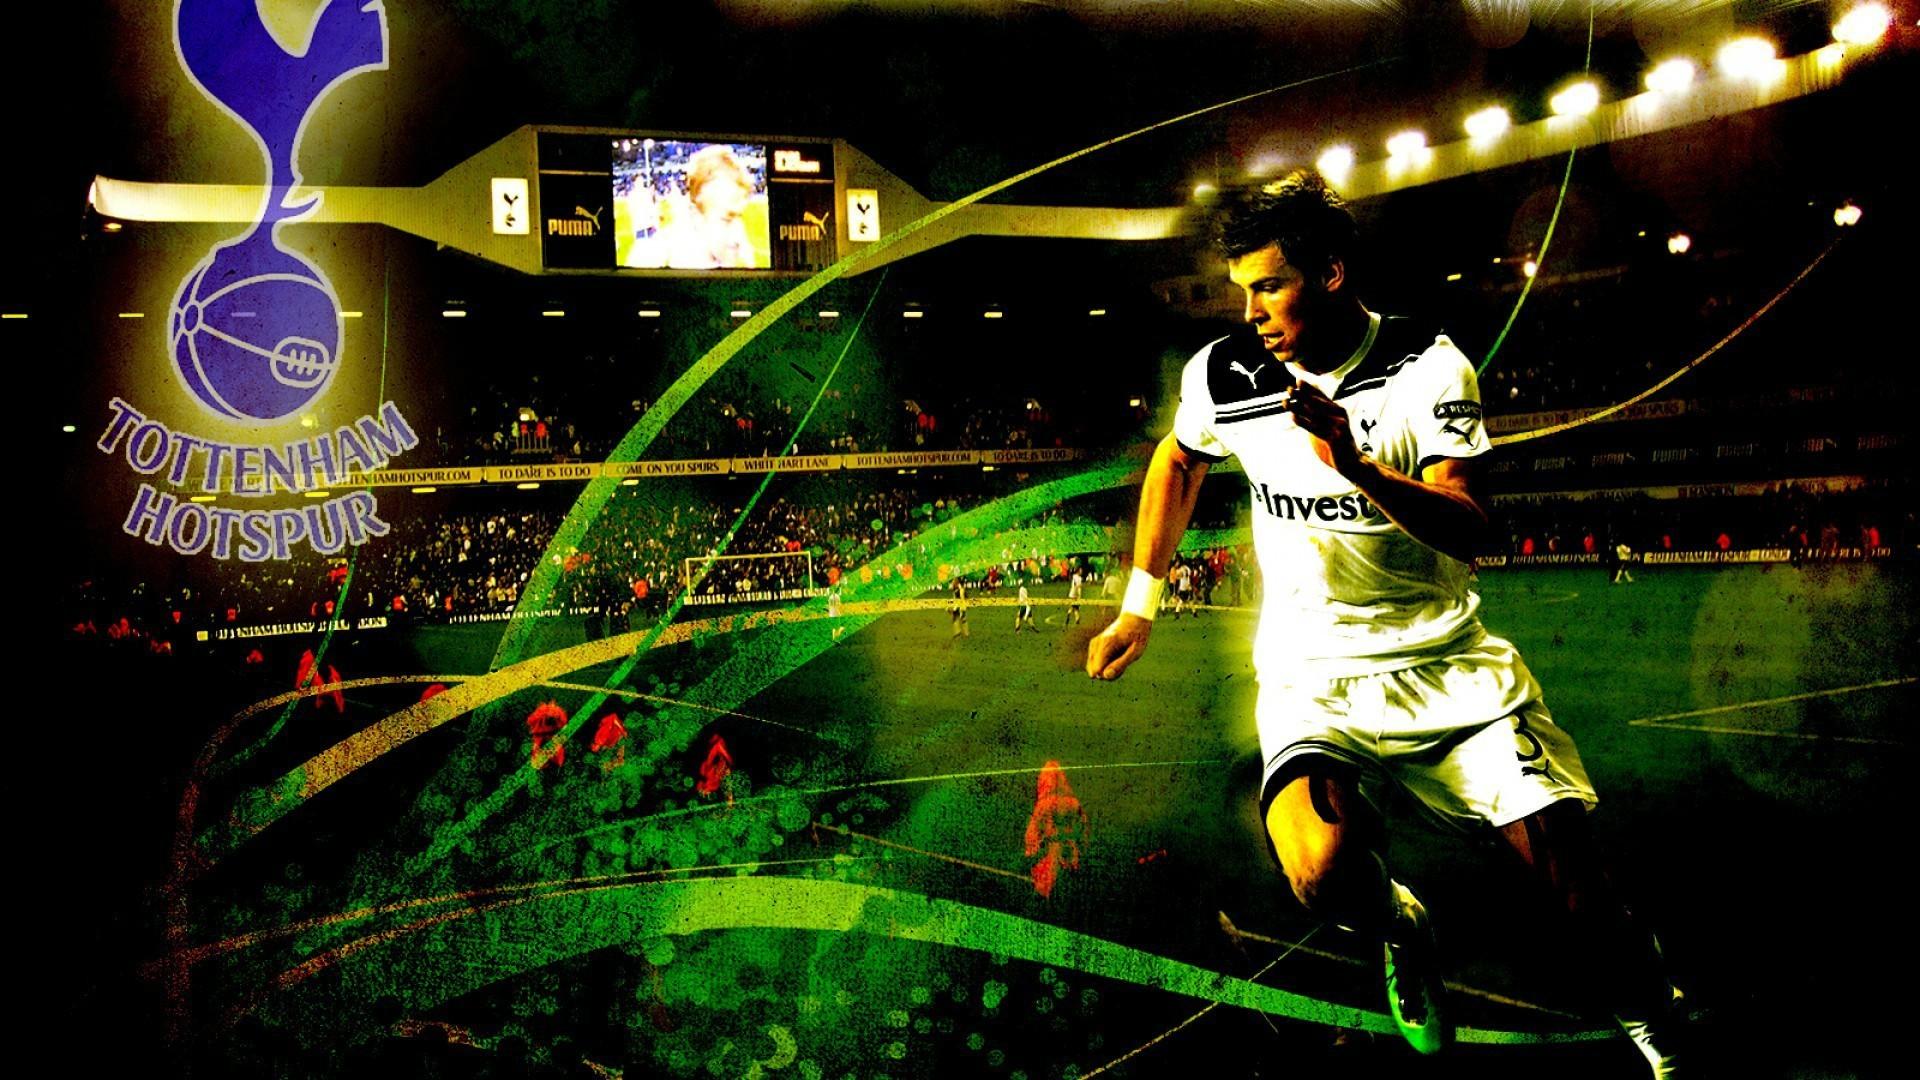 Gareth Bale Tottenham Hotspur Wallpaper High Quality